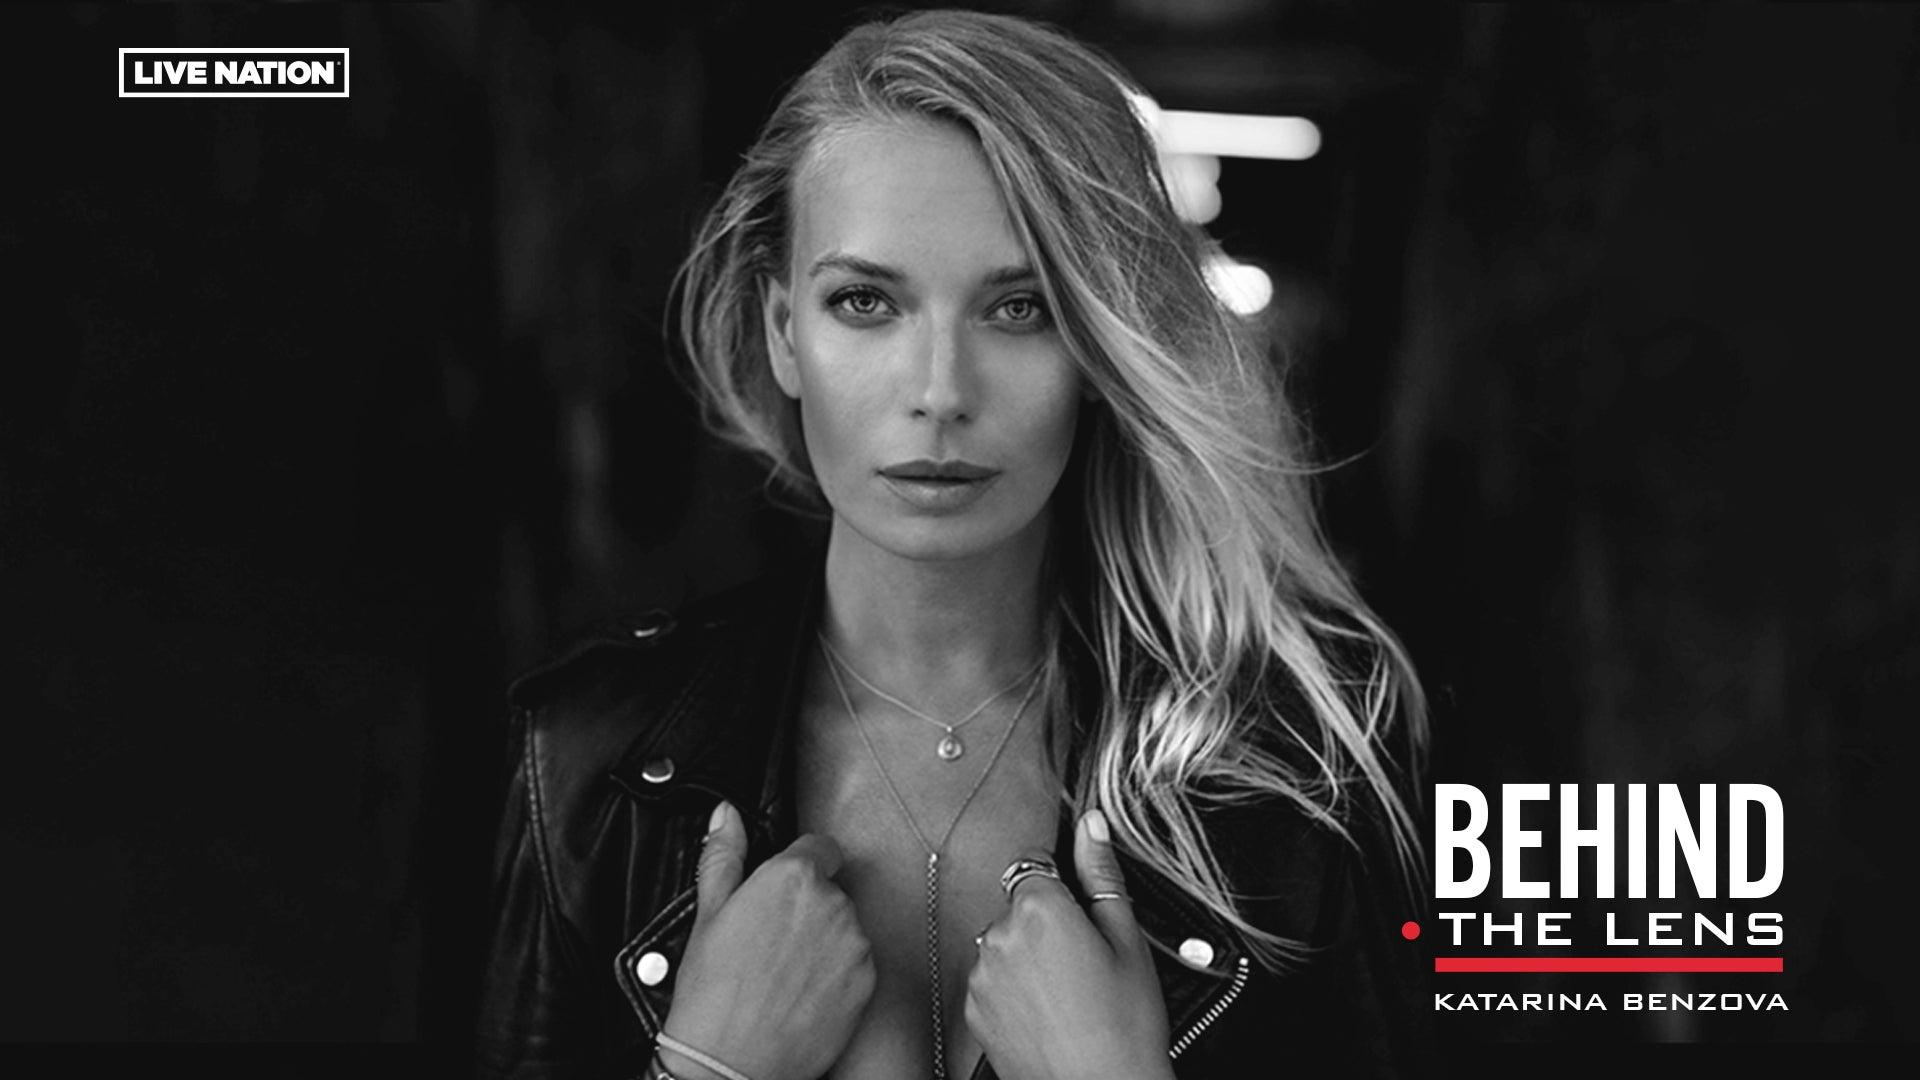 Behind The Lens: Katarina Benzova